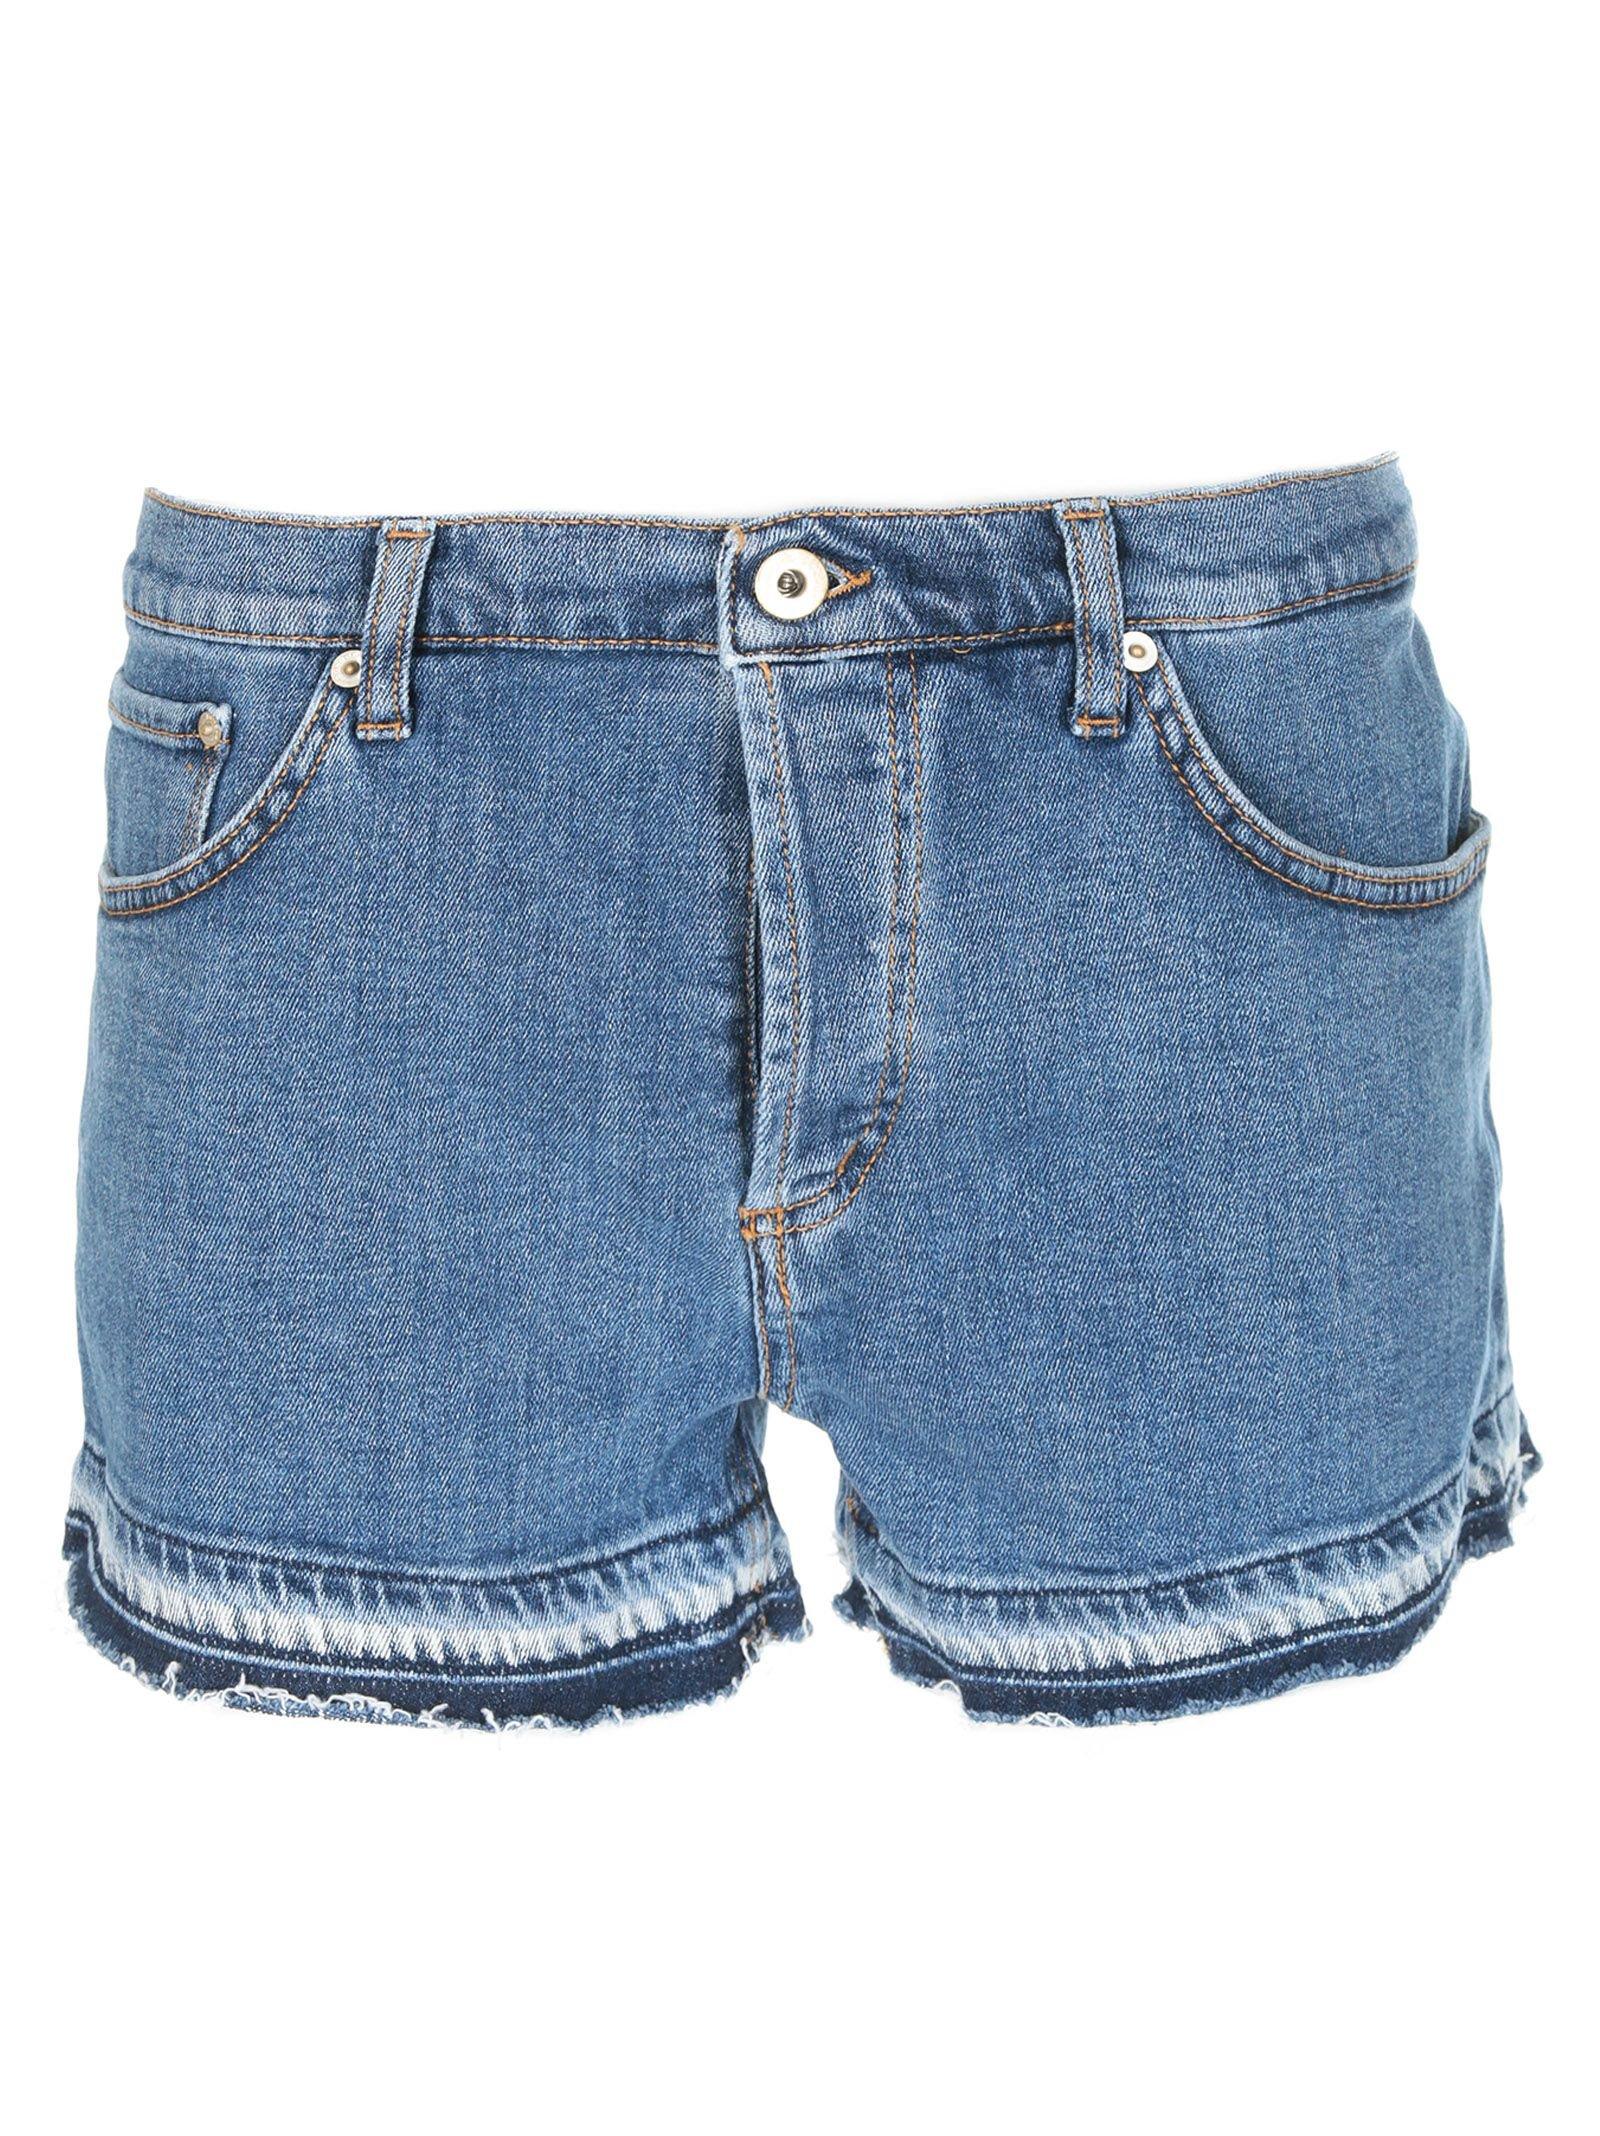 Dondup Frayed Denim Shorts